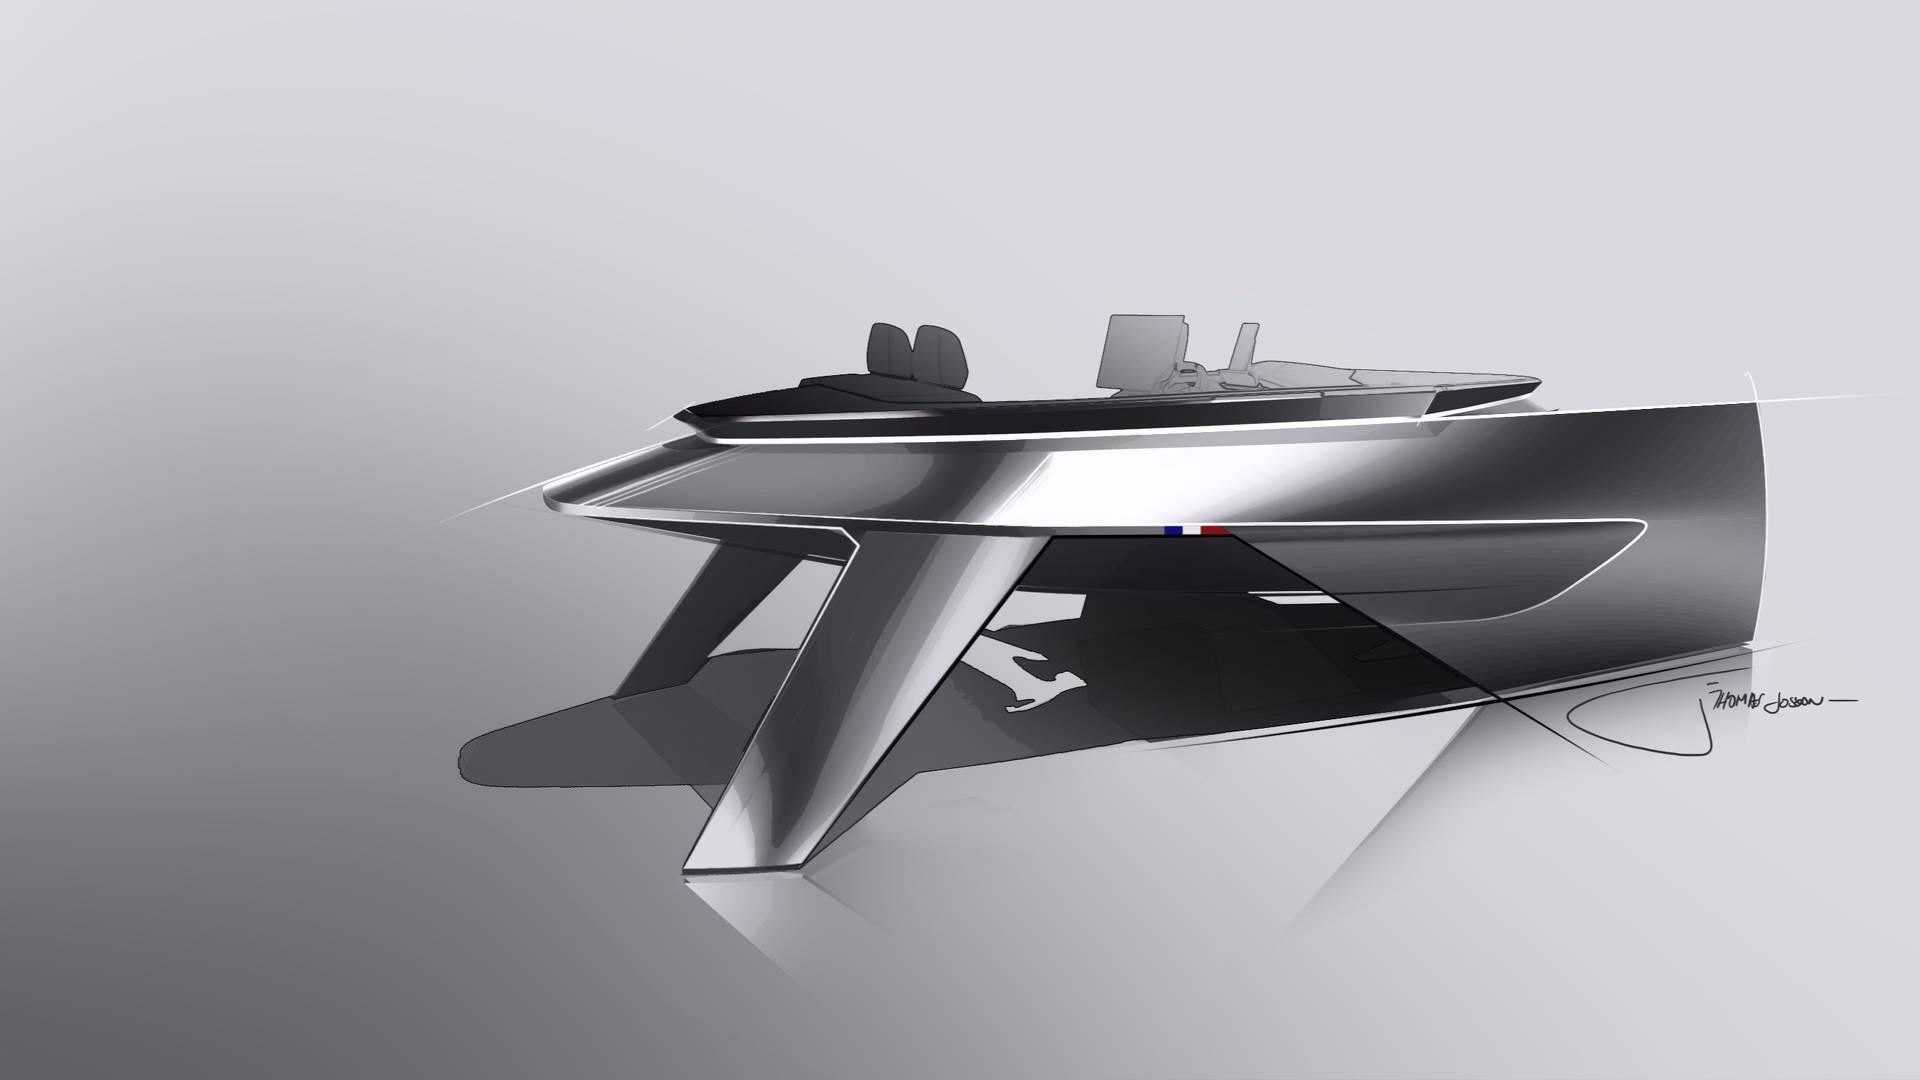 peugeot-sea-drive-concept 4.pg - Copy